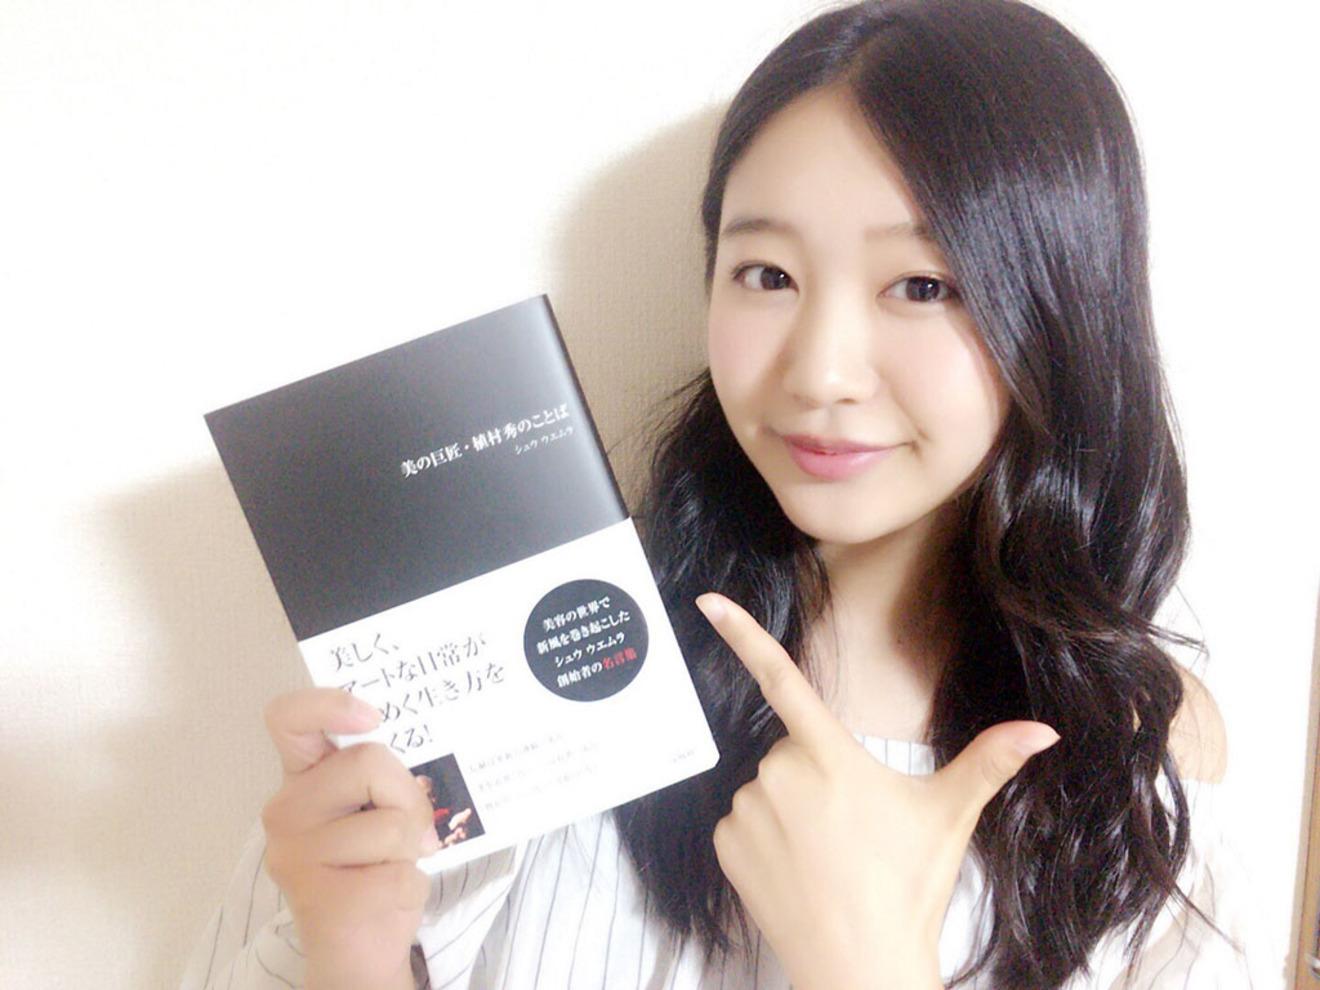 SUPER☆GiRLS内村莉彩が自分を変えるために学んだ本2冊